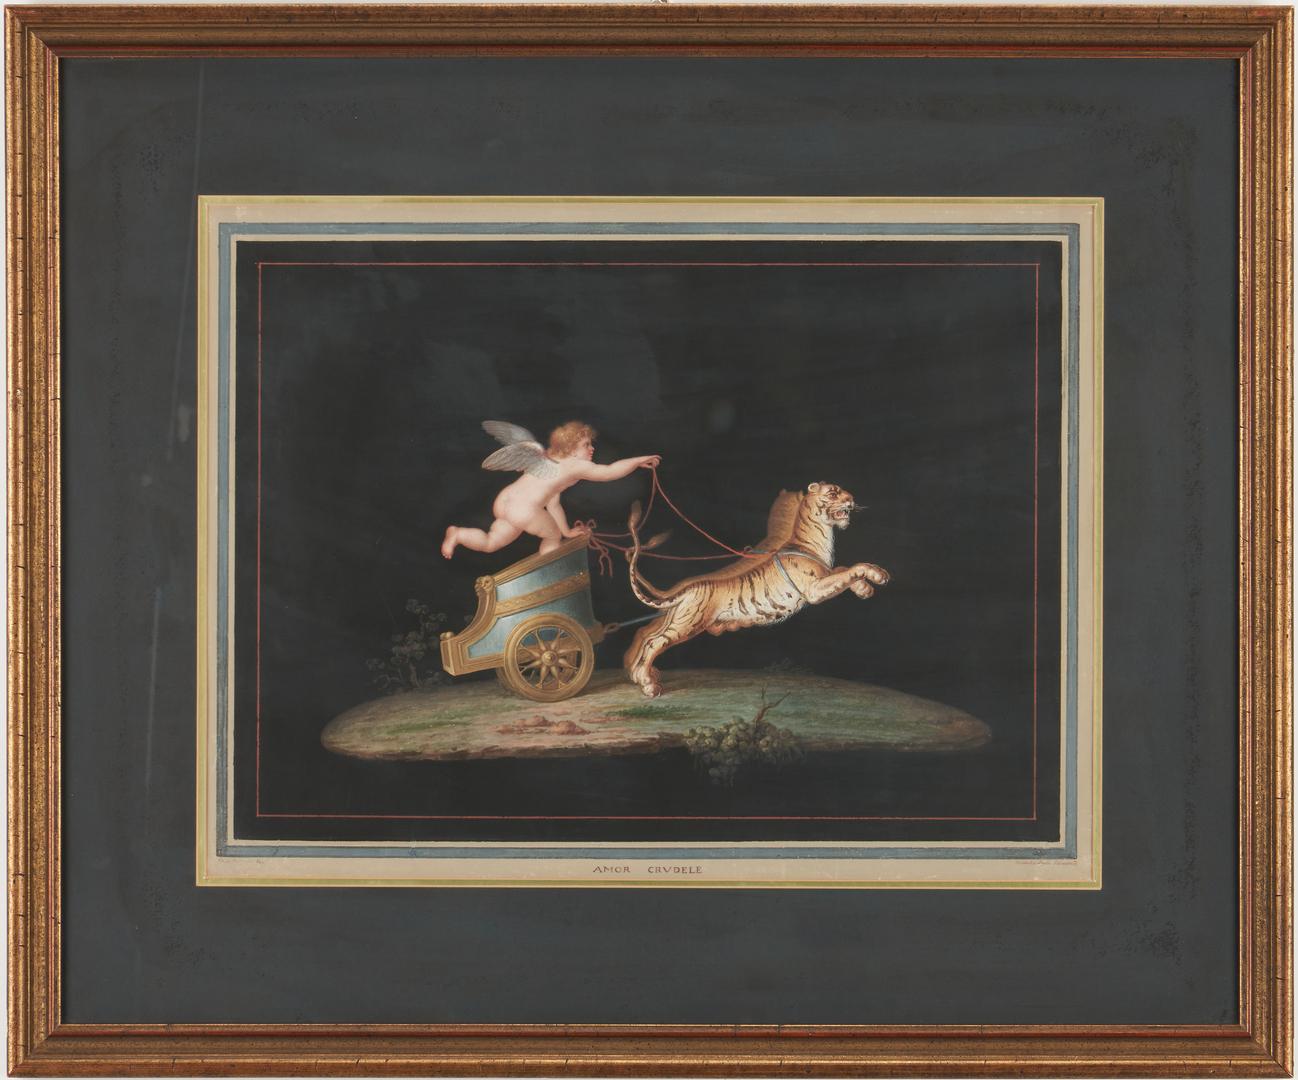 Lot 104: 4 Attr. Michelangelo Maestri, Classical Watercolors